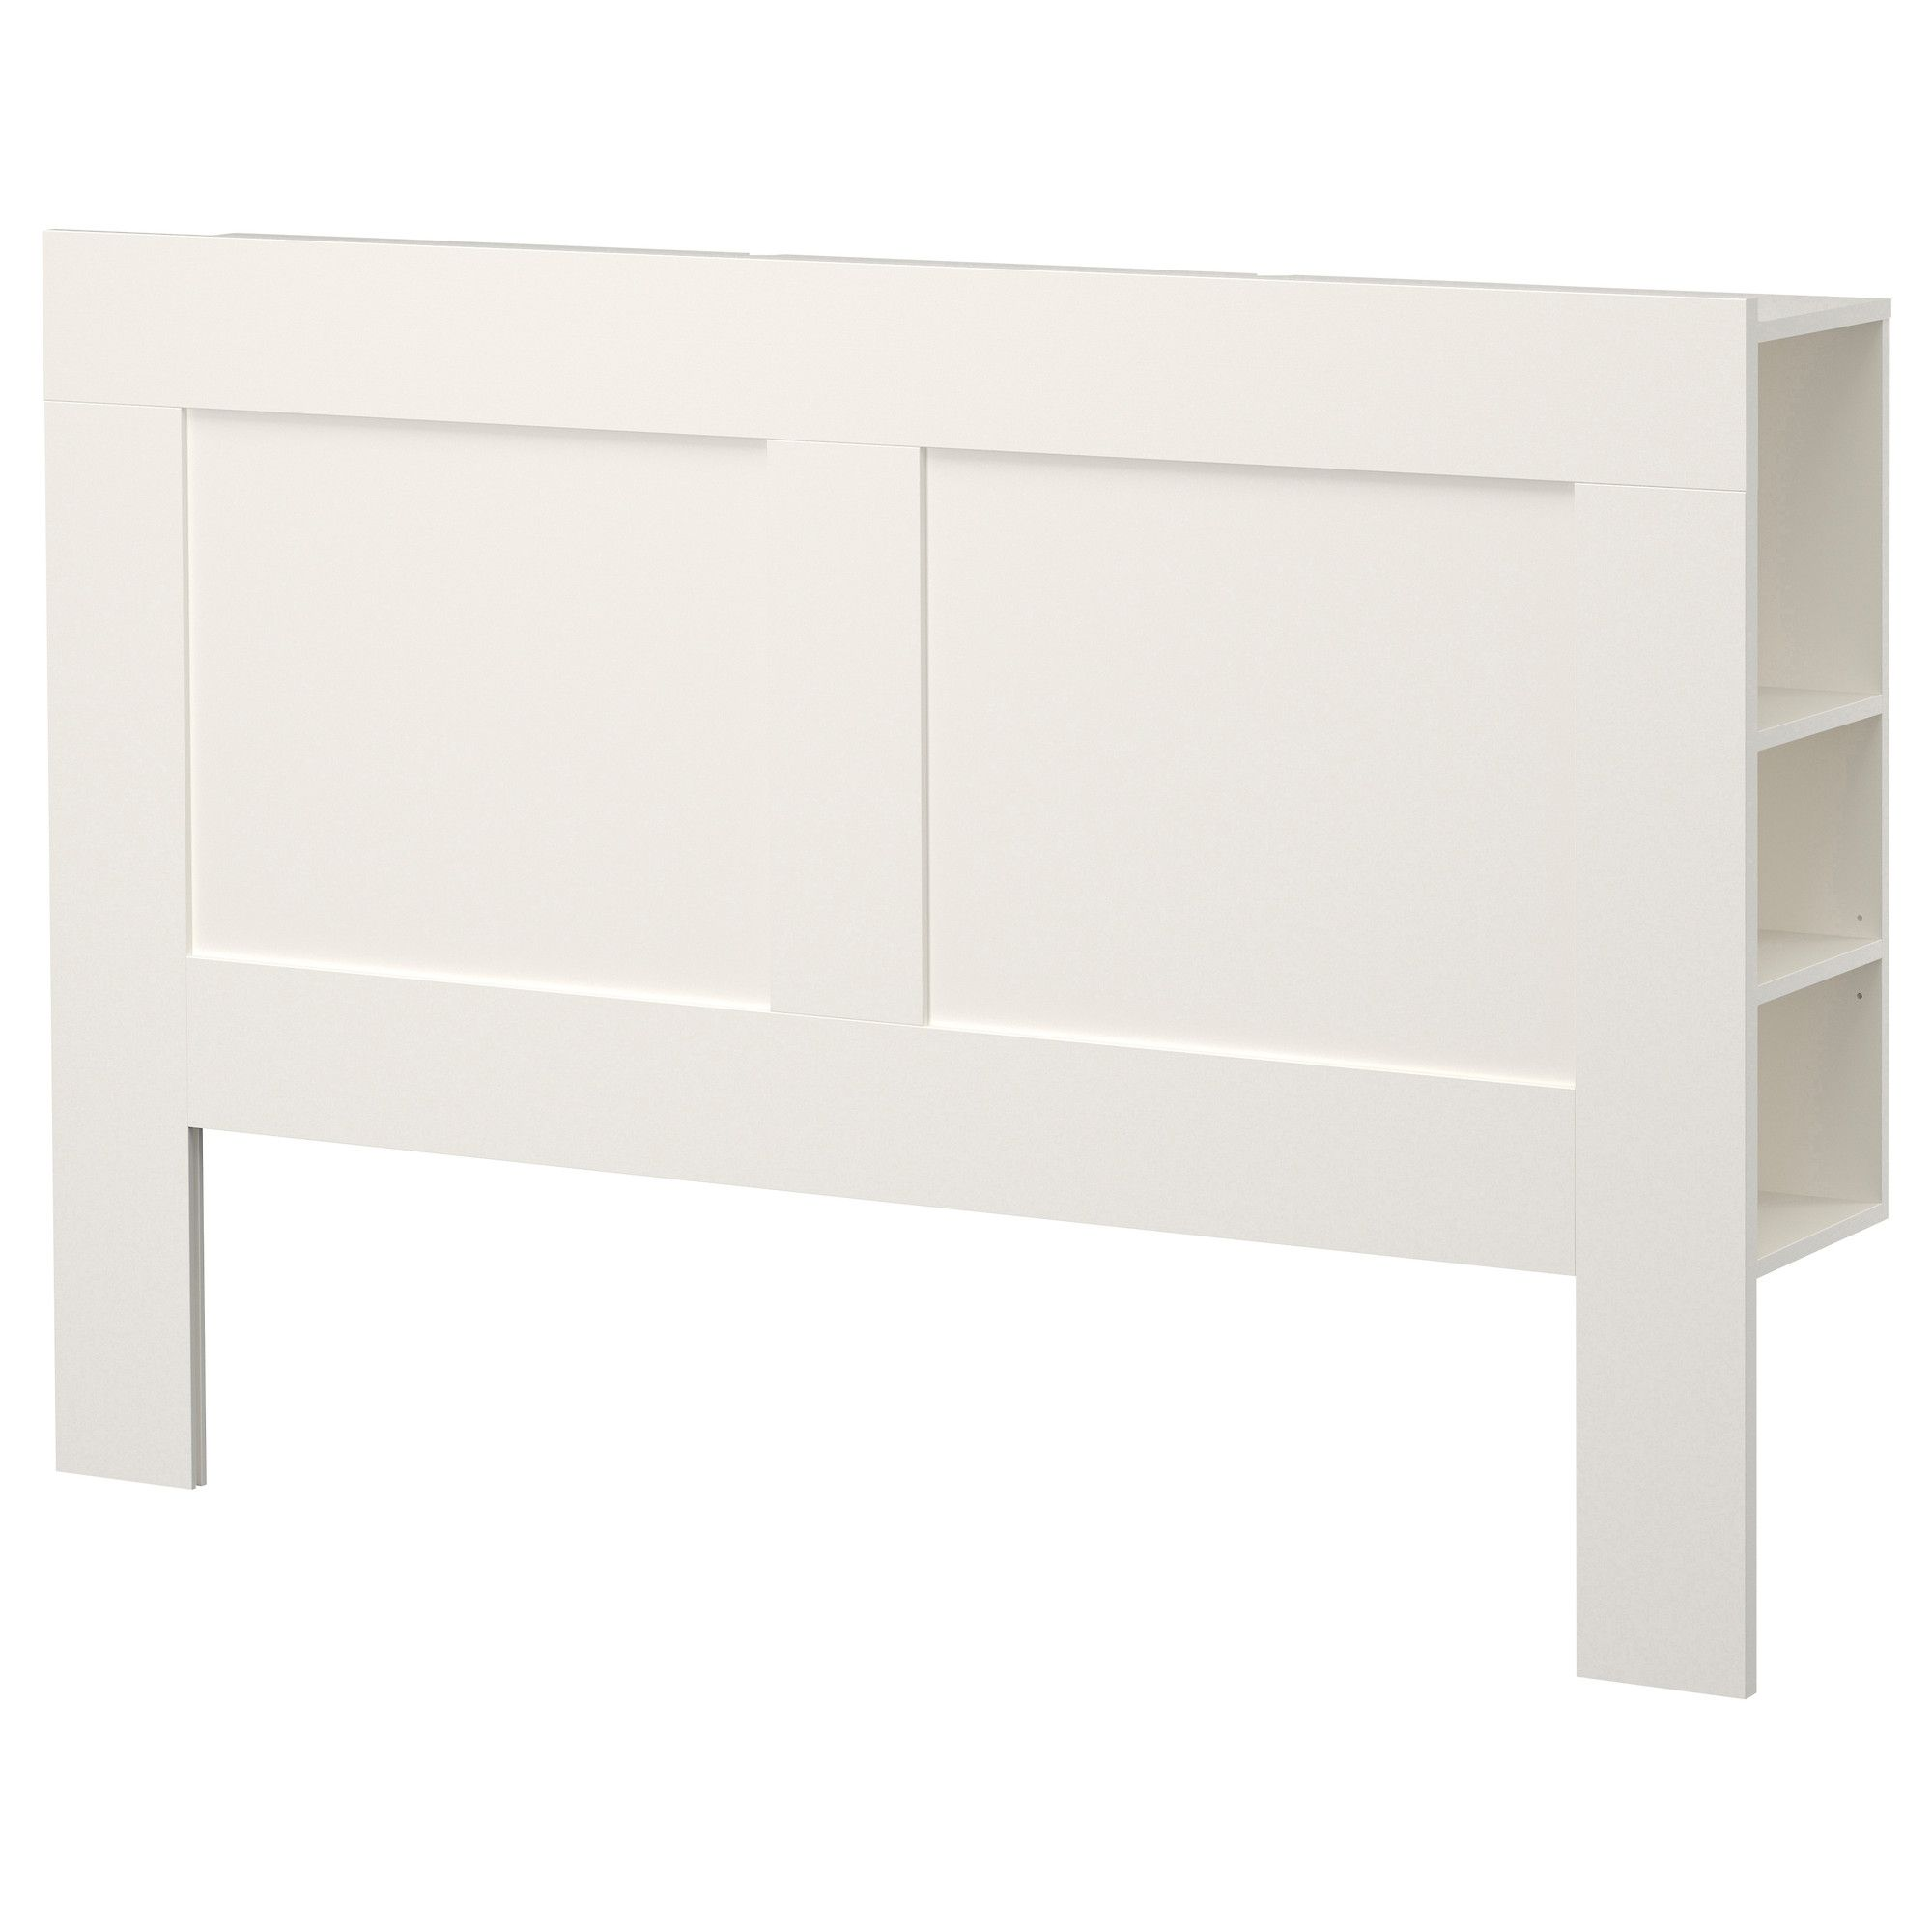 BIRKELAND Bed frame Full IKEA Headboard + footboard